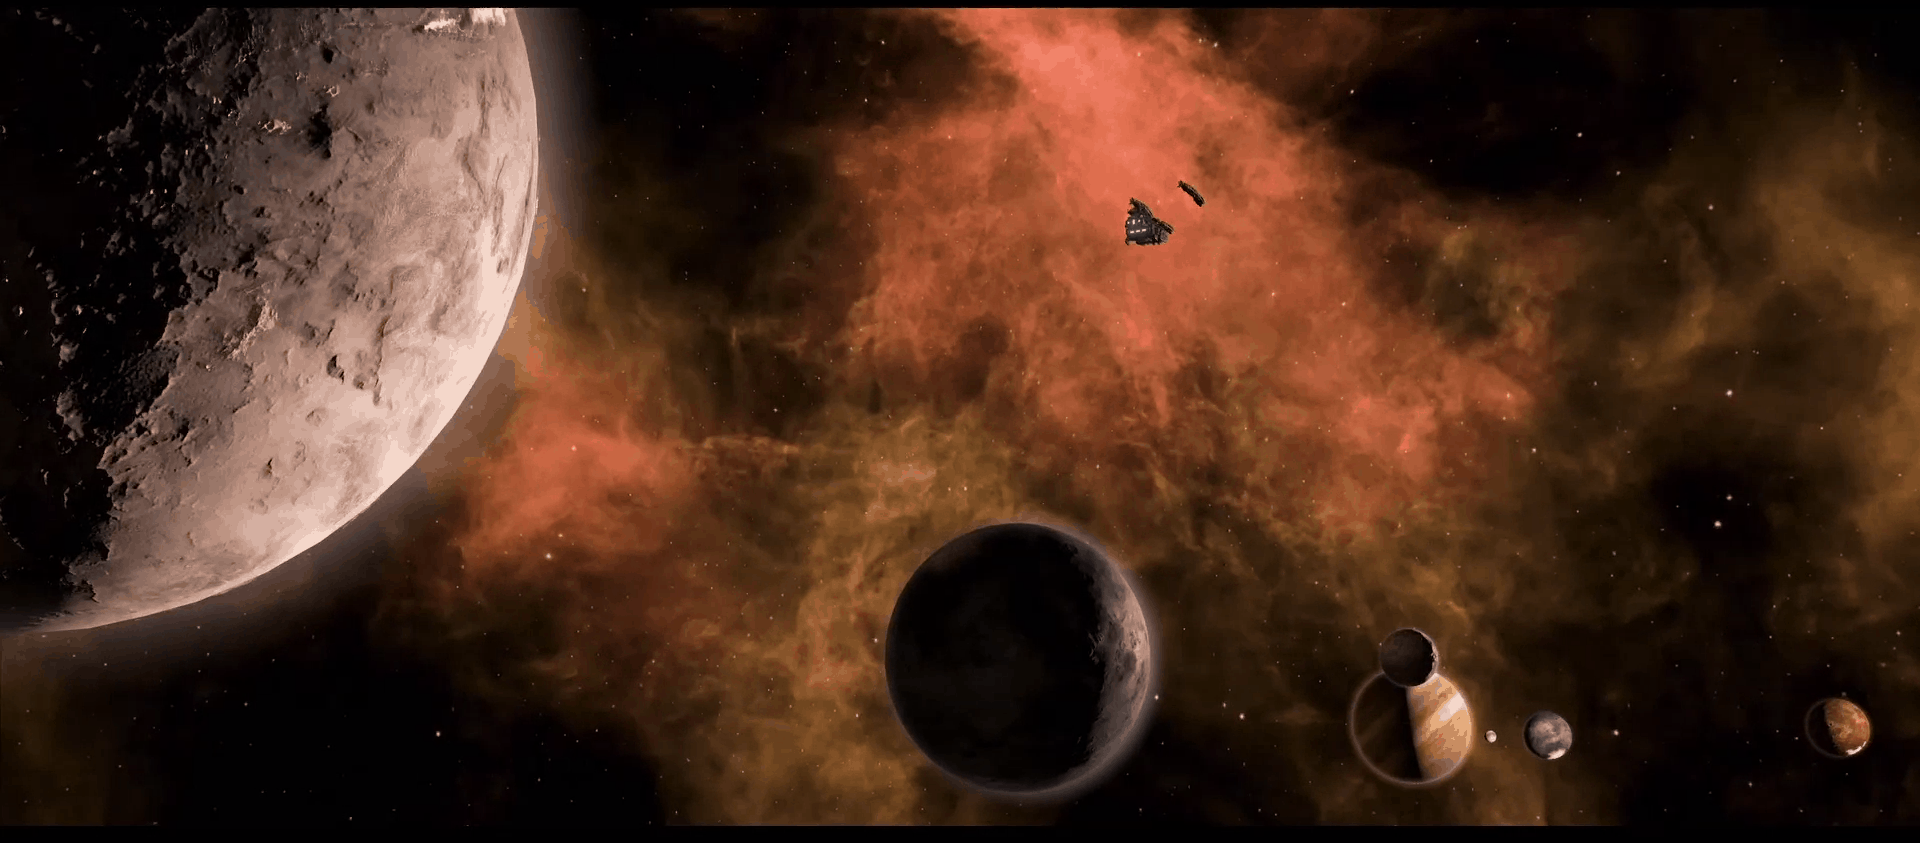 Stellaris: How to Uplift